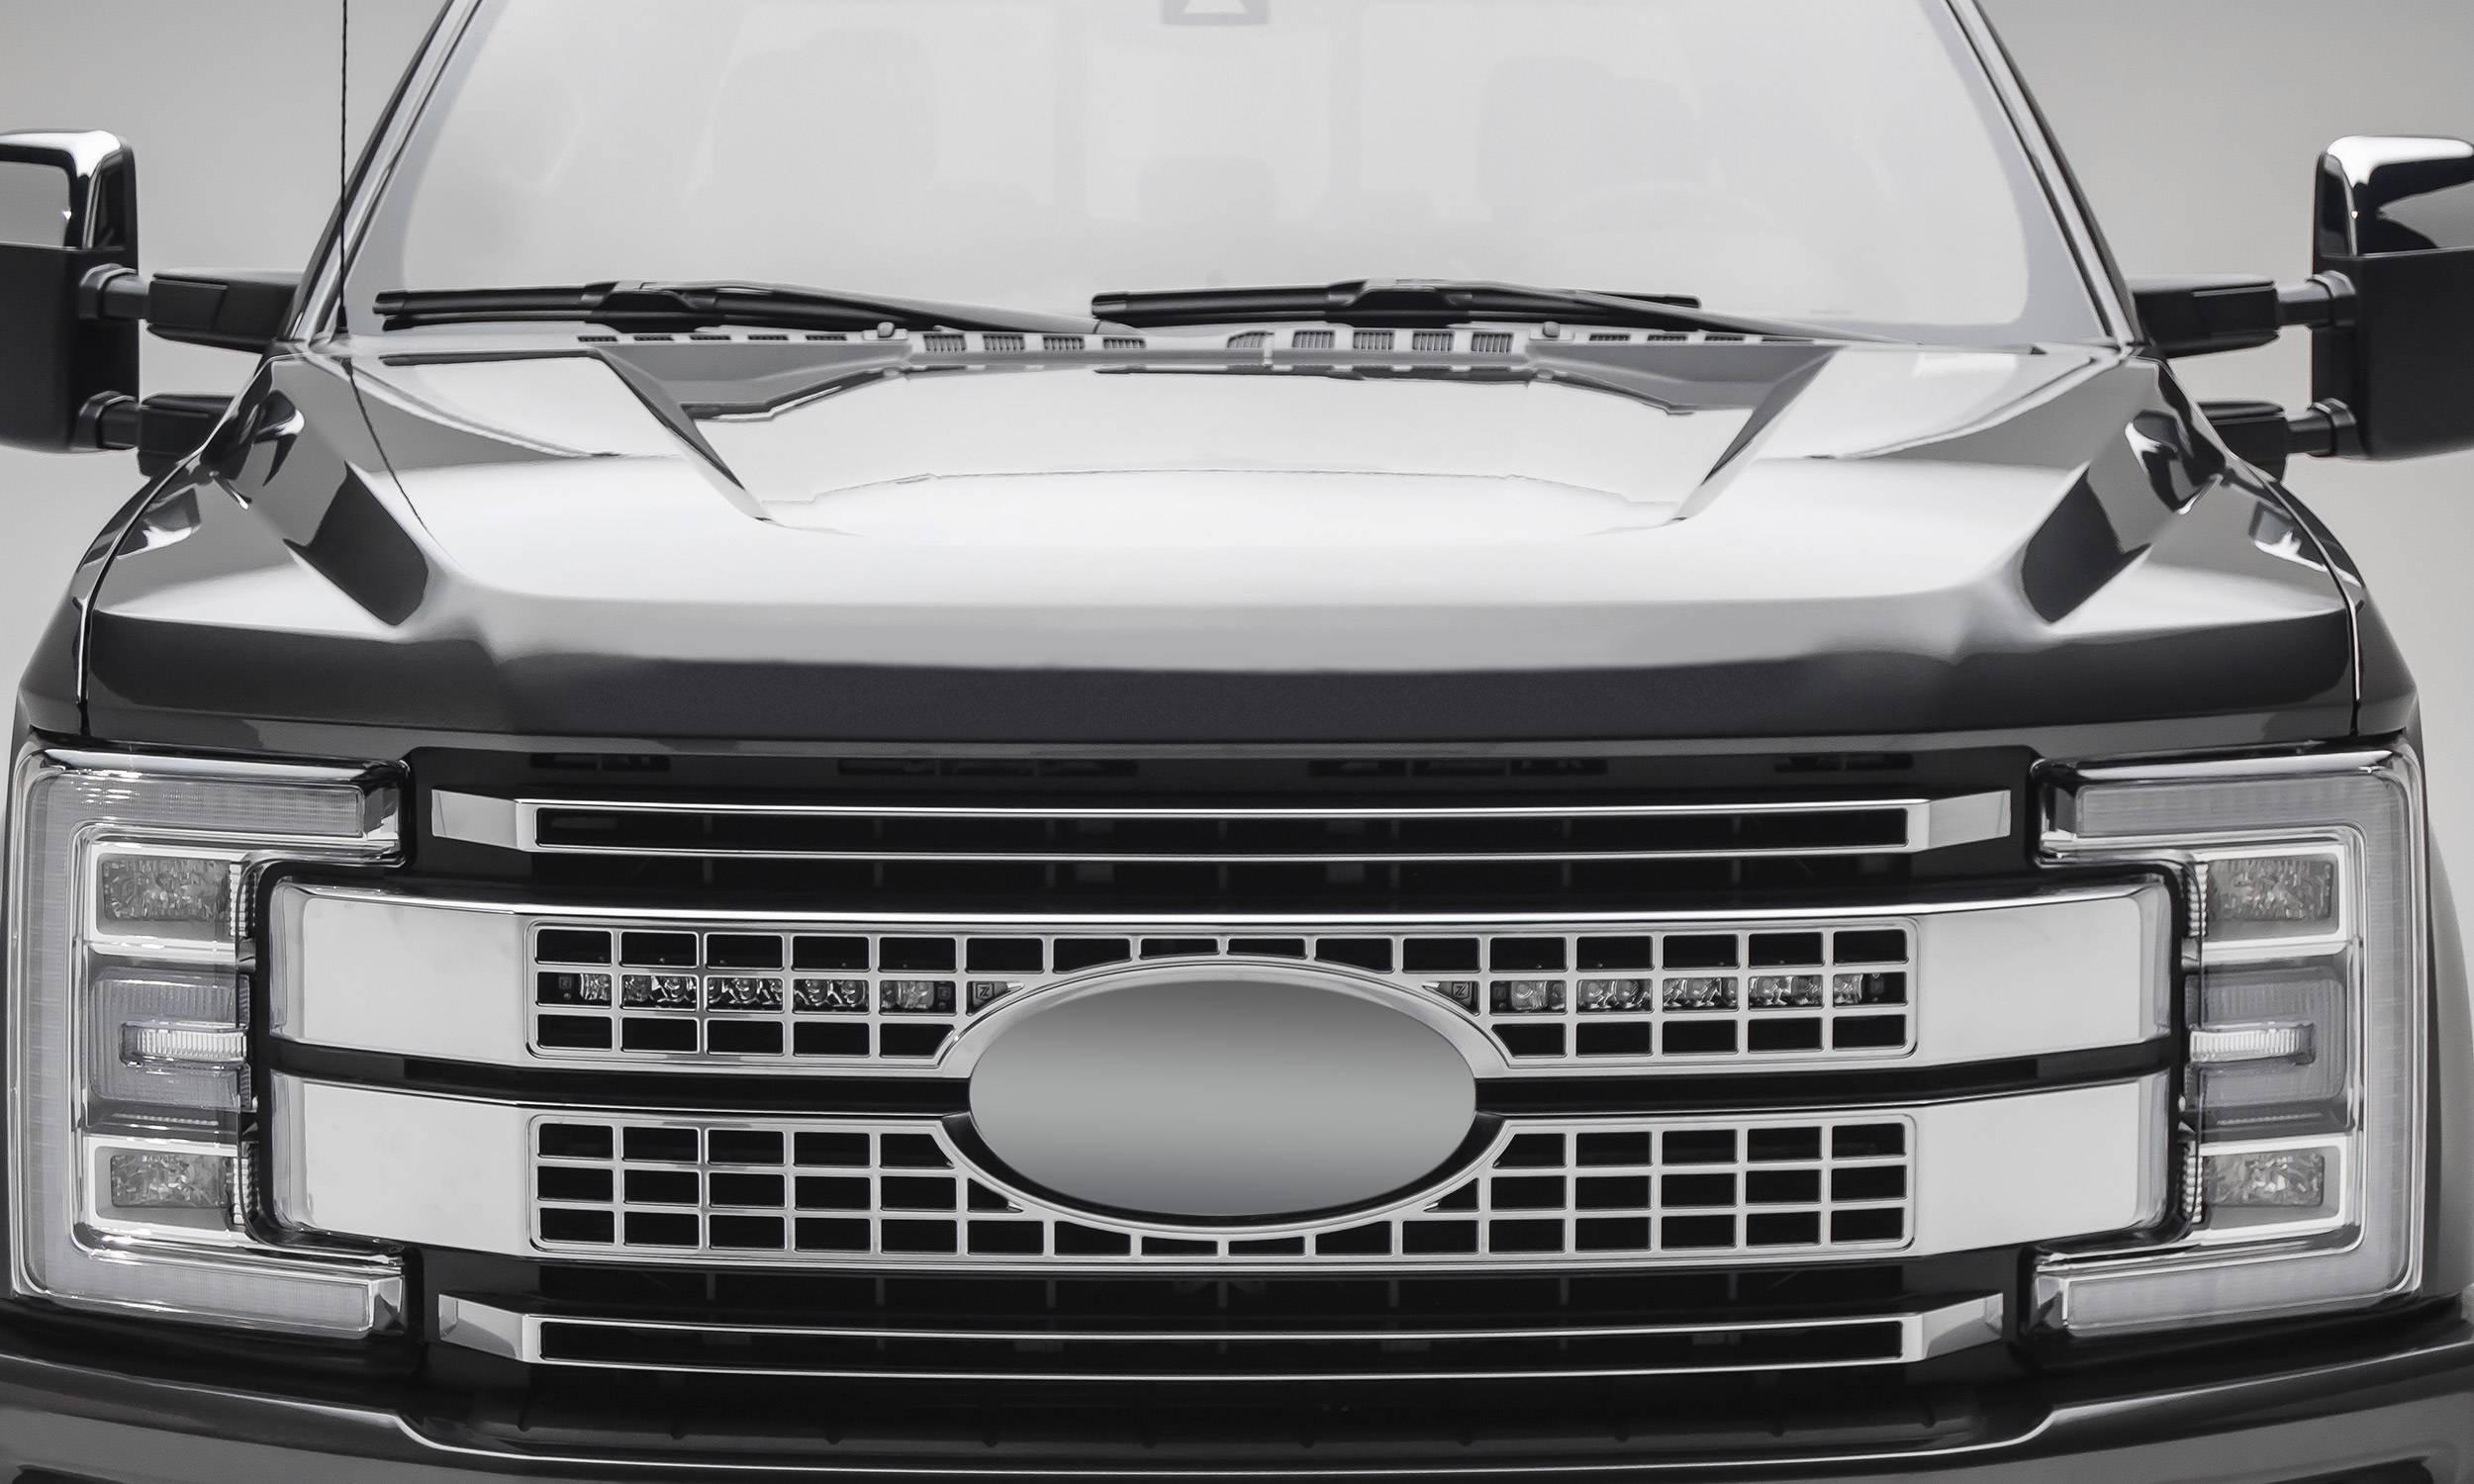 ZROADZ - 2017-2019 Ford Super Duty Platinum OEM Grille LED Kit with (2) 10 Inch LED Single Row Slim Light Bar - PN #Z415371-KIT